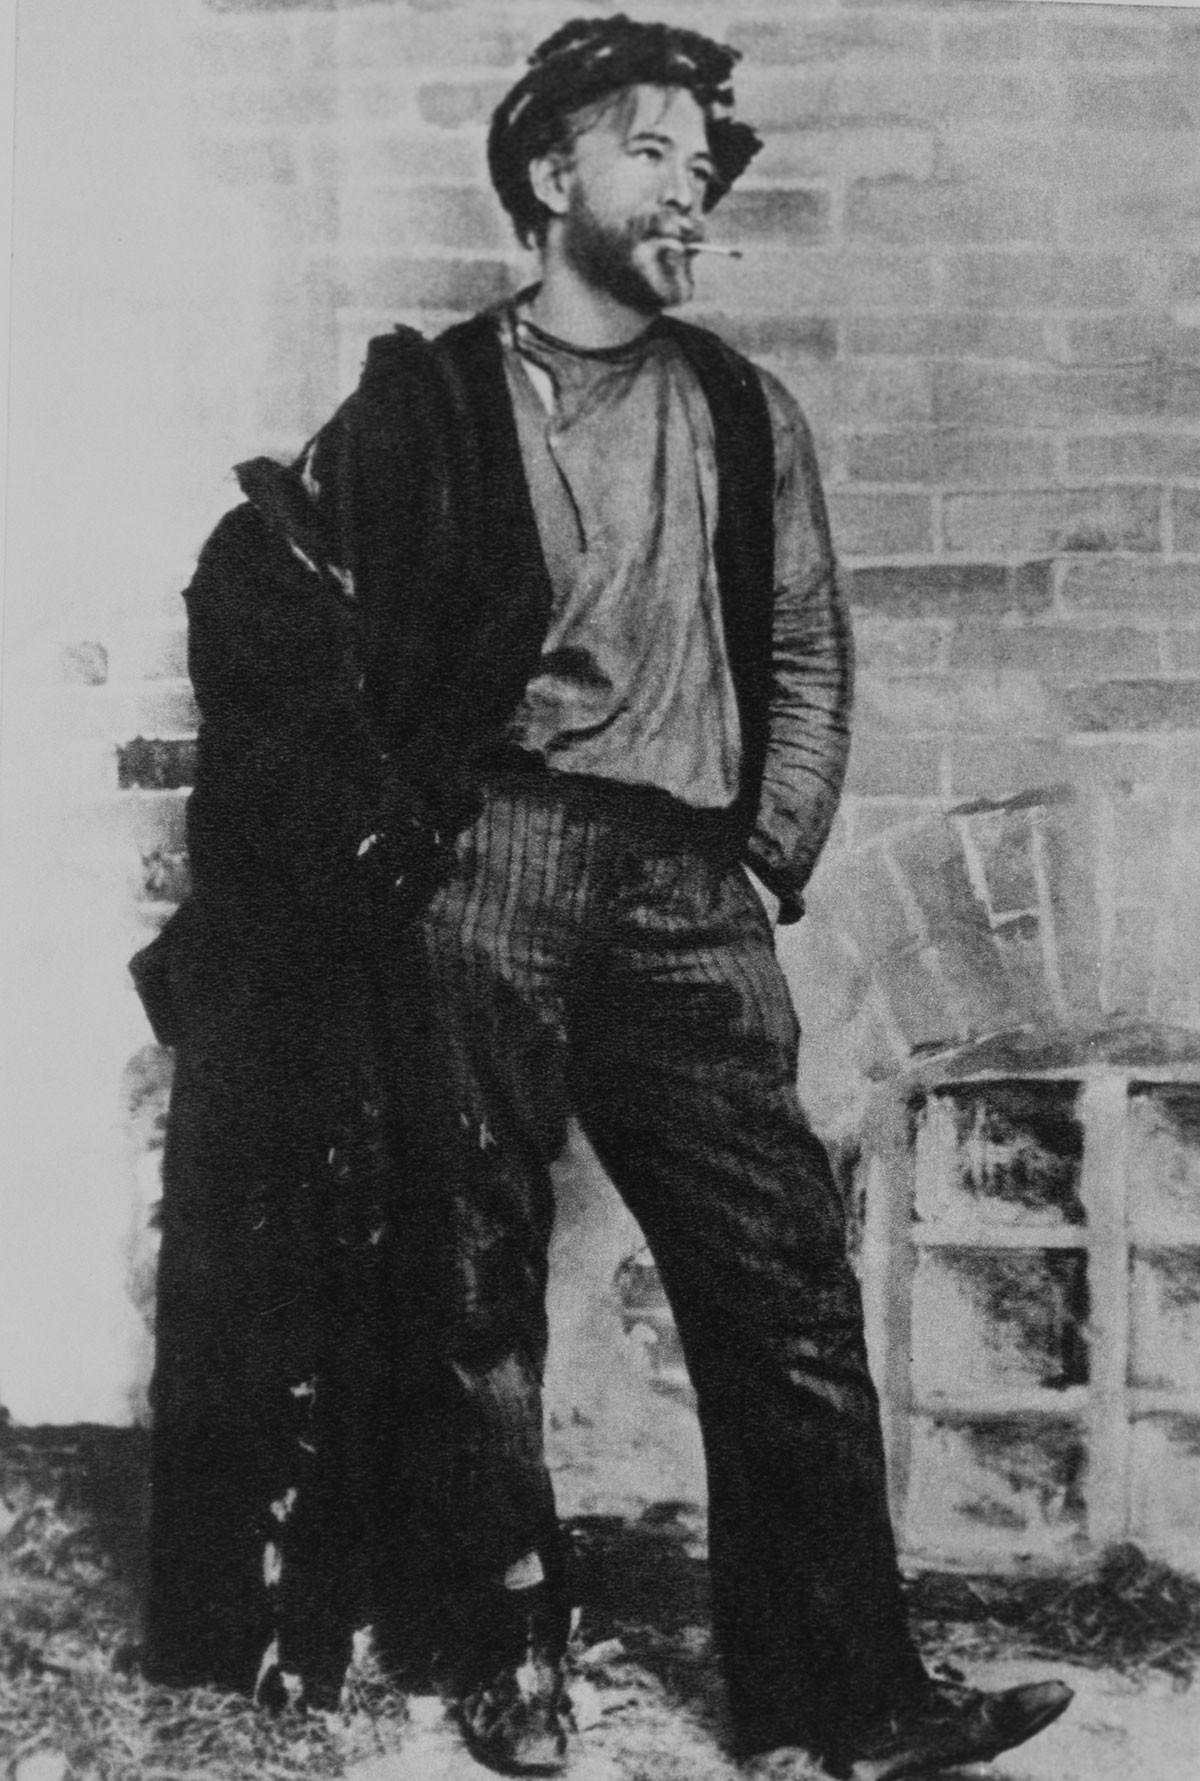 Konstantin Stanislavsky as Satin in 'Lower Depths'.